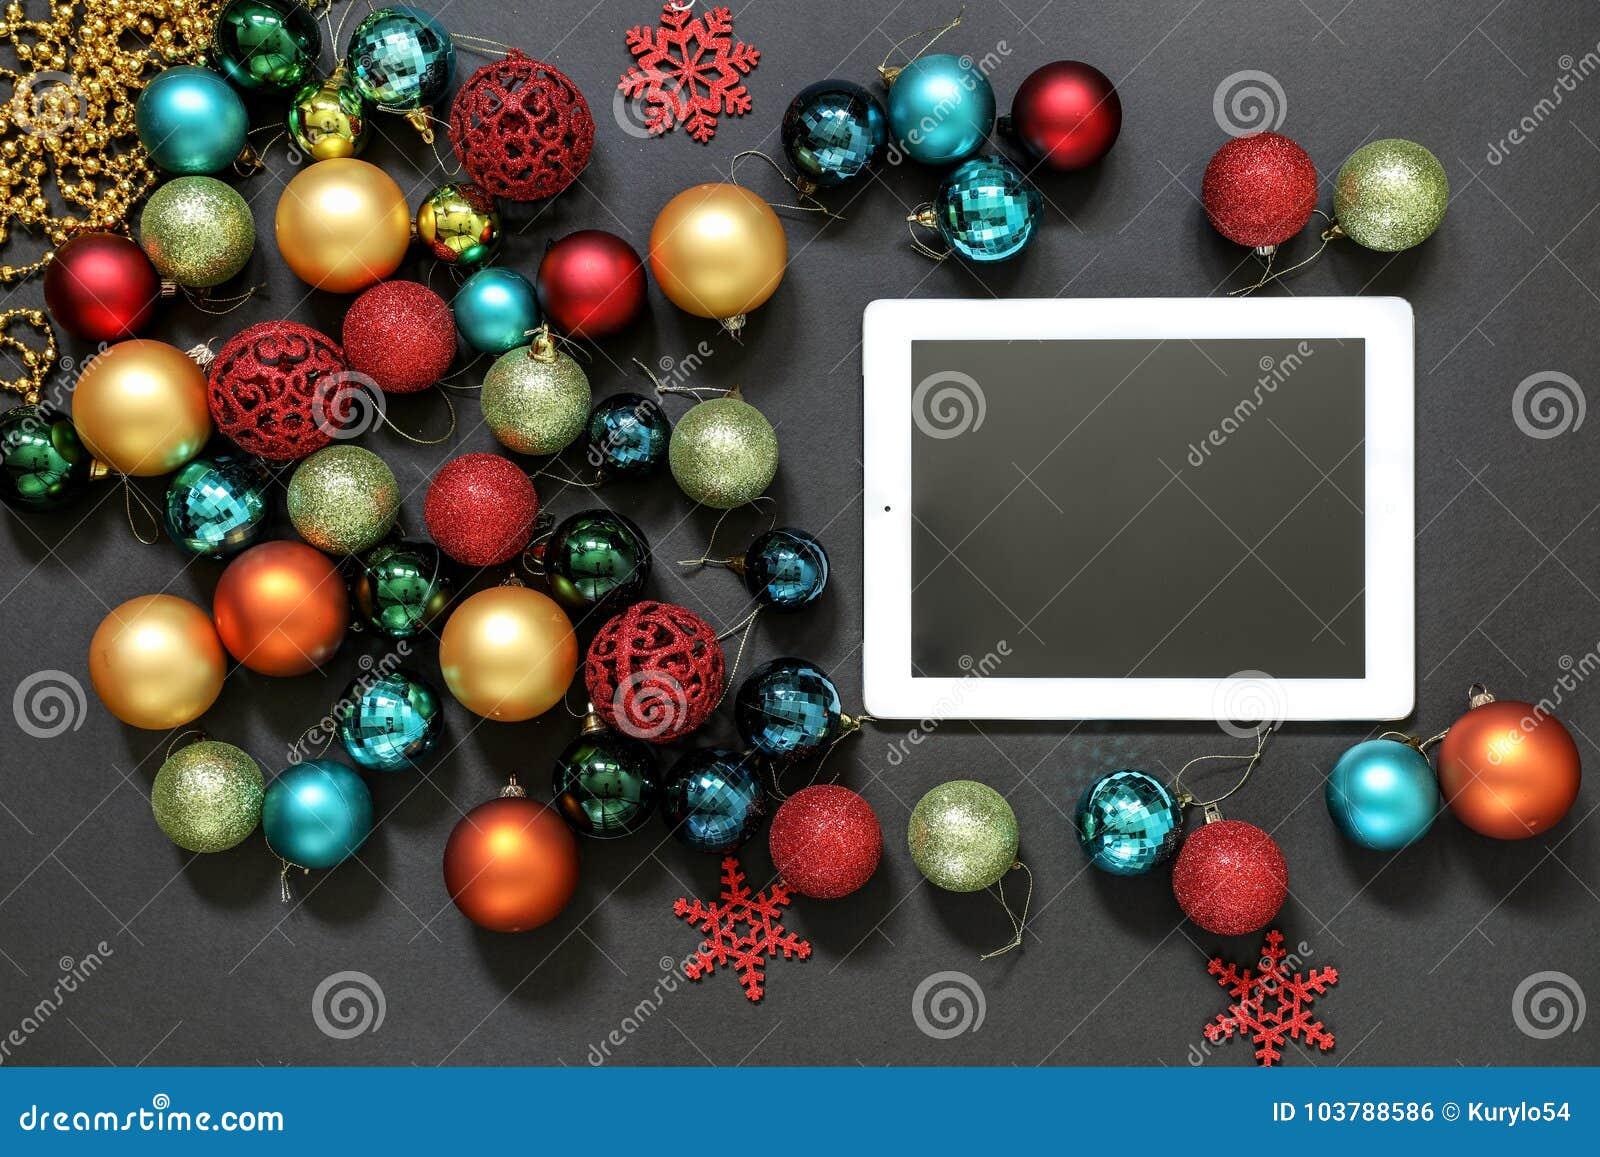 christmas tree toys balls and ipad on dark background